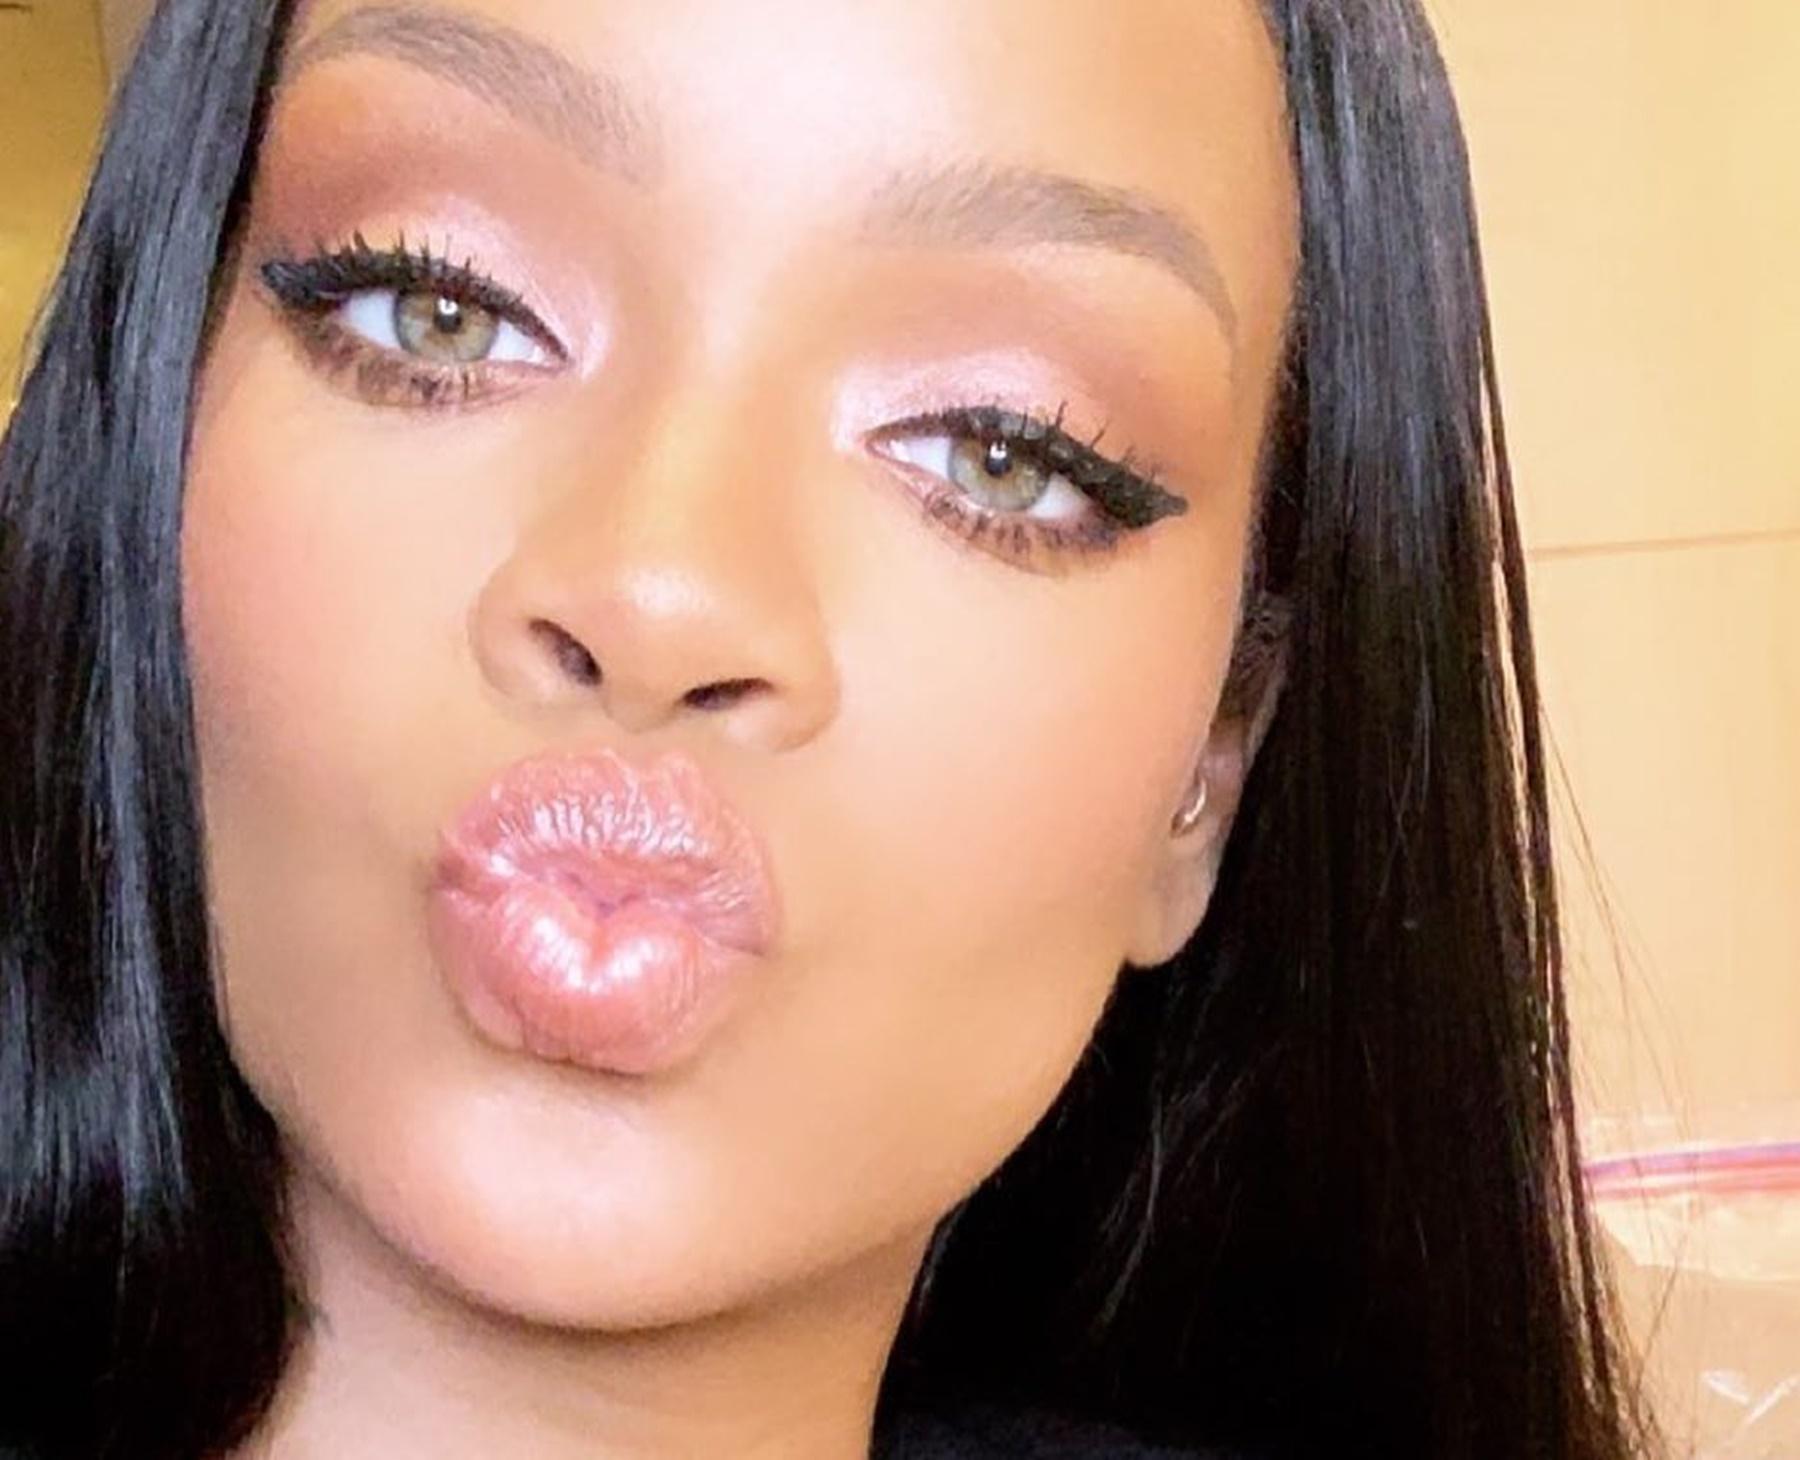 Rihanna Lingerie Makeup Company Fenty